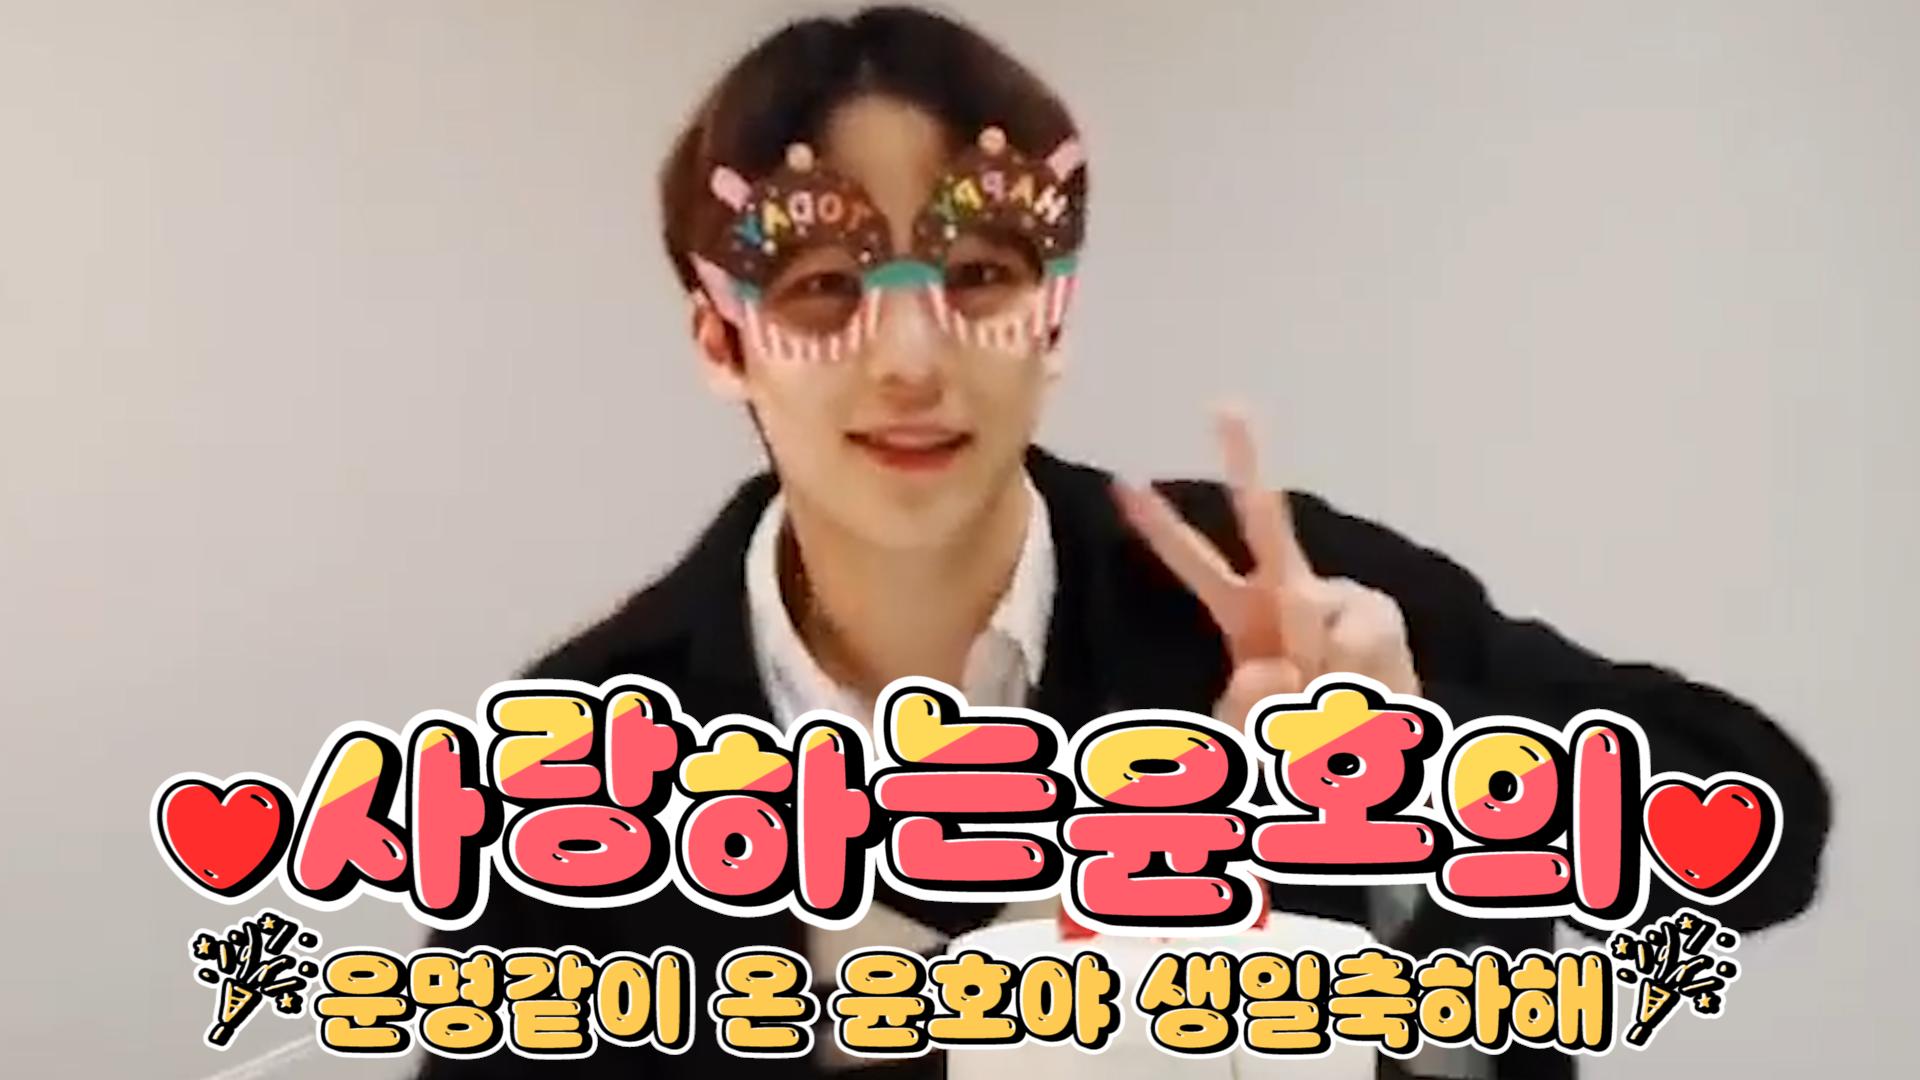 [ATEEZ] 말랑딸기볼 대왕강쥐 태어나자마자 전국민이 Olleh!!를 외쳤죠🎉🐶🍓 (HAPPY YUNHO DAY!)